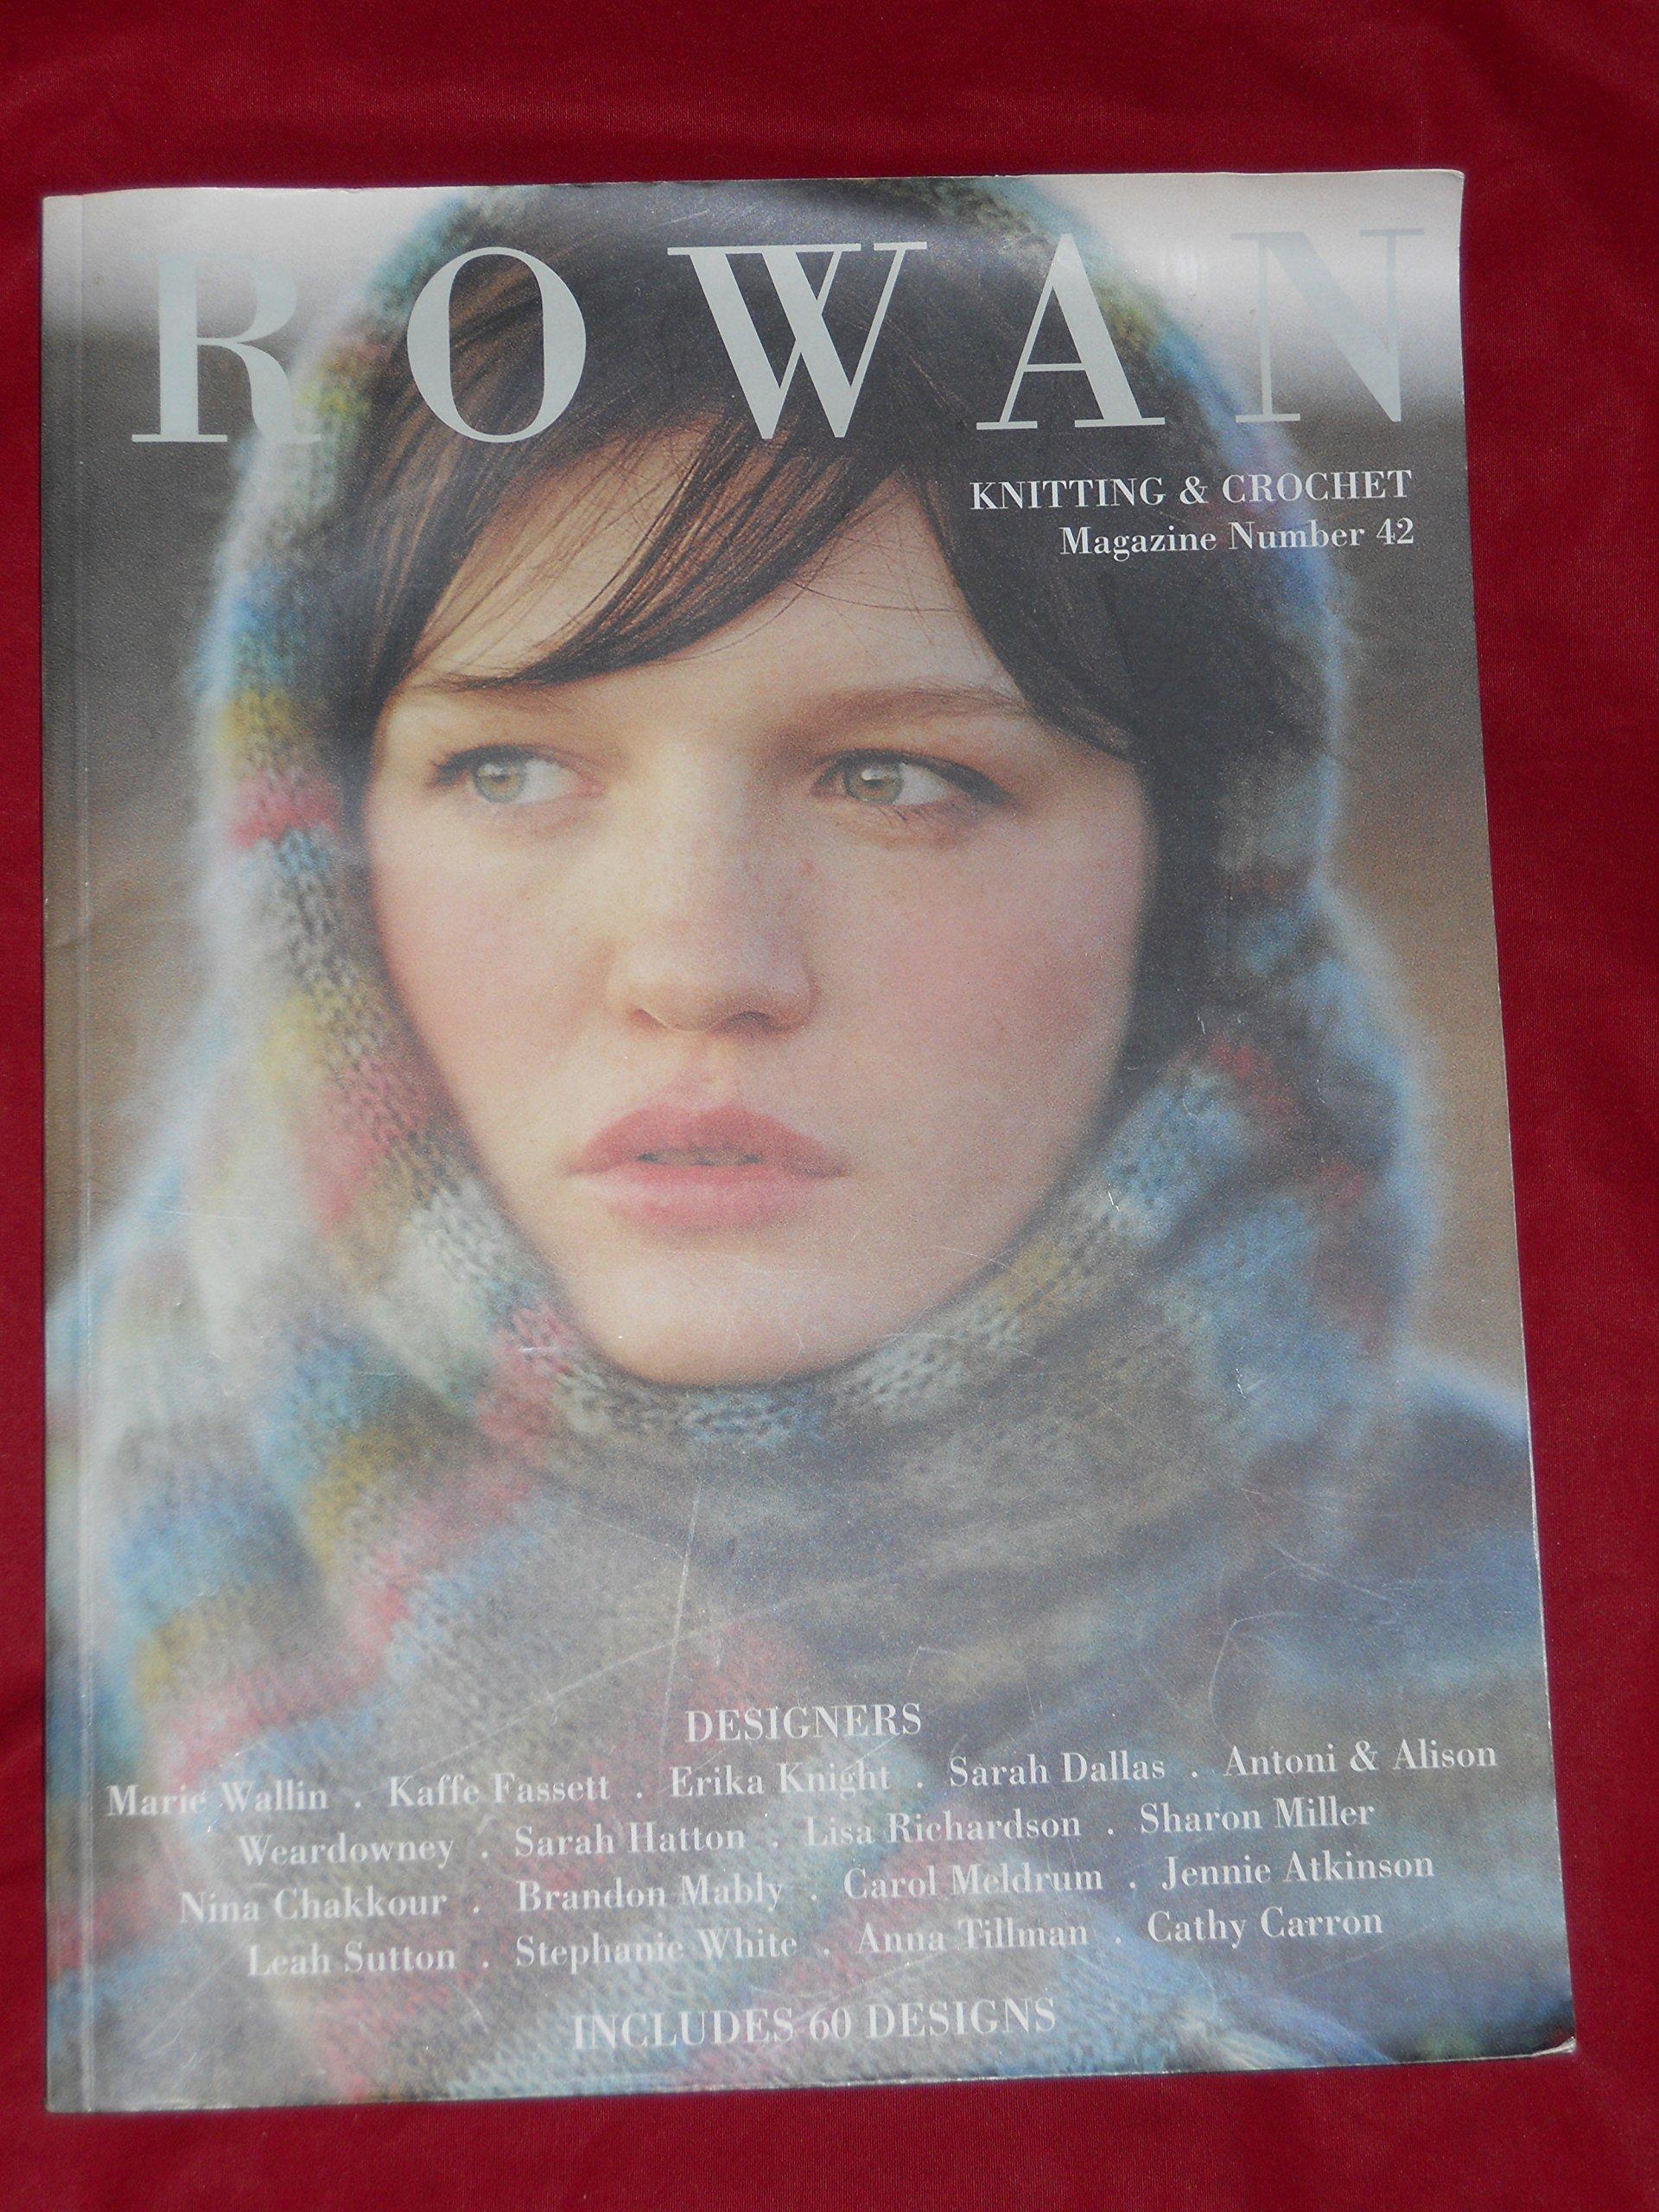 Read Online Rowan Knitting & Crochet Magazine No. 42 PDF